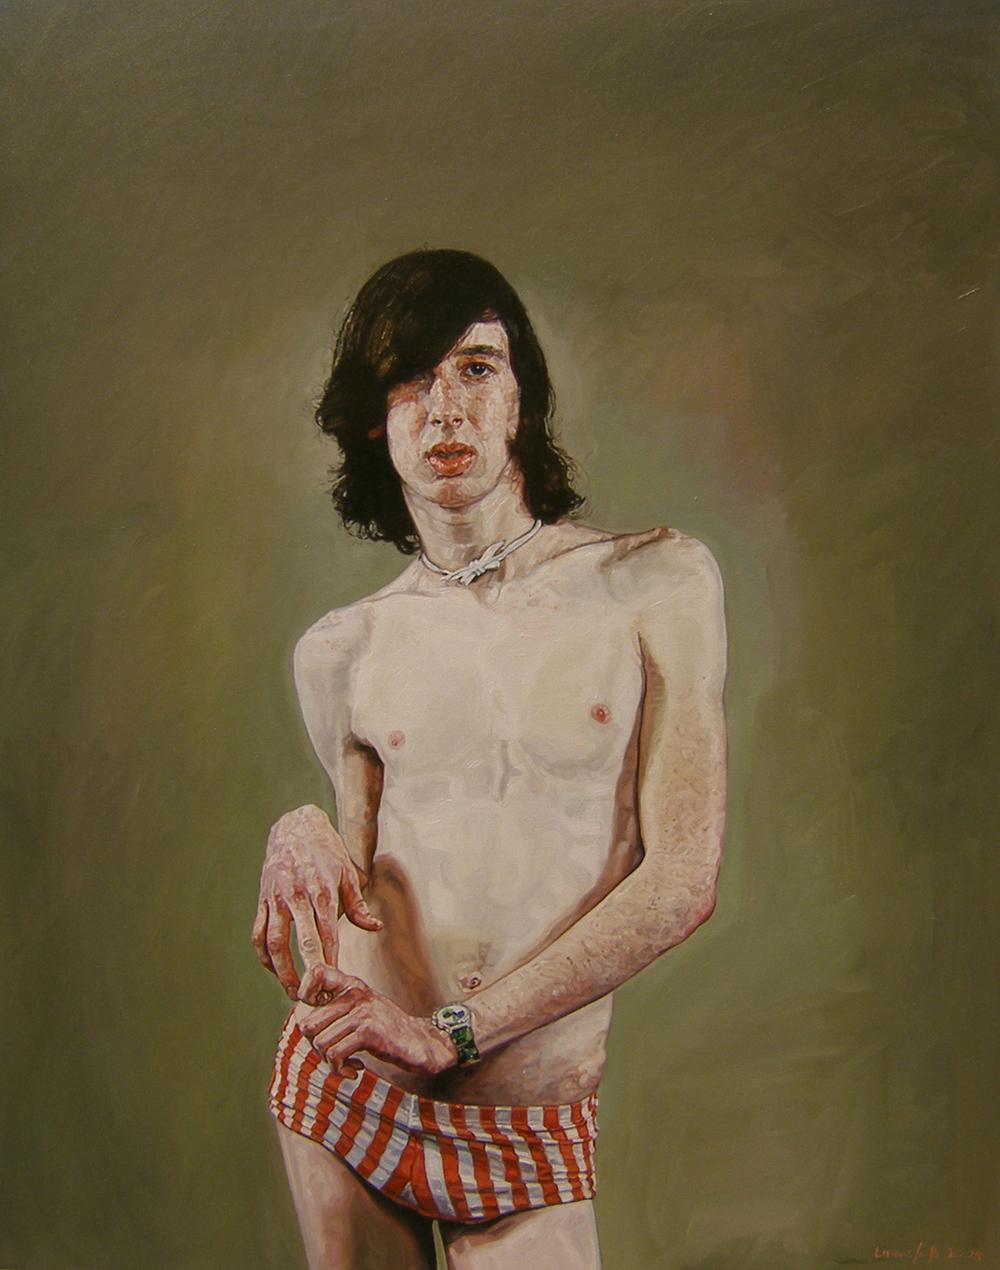 Ulrich Lamsfuss   Mireya Acierto- Todos Sois Unos Chulazos 1 (175/11) , 2005 Oil on canvas 49.21 x 39.37 inches 125 x 100 cm